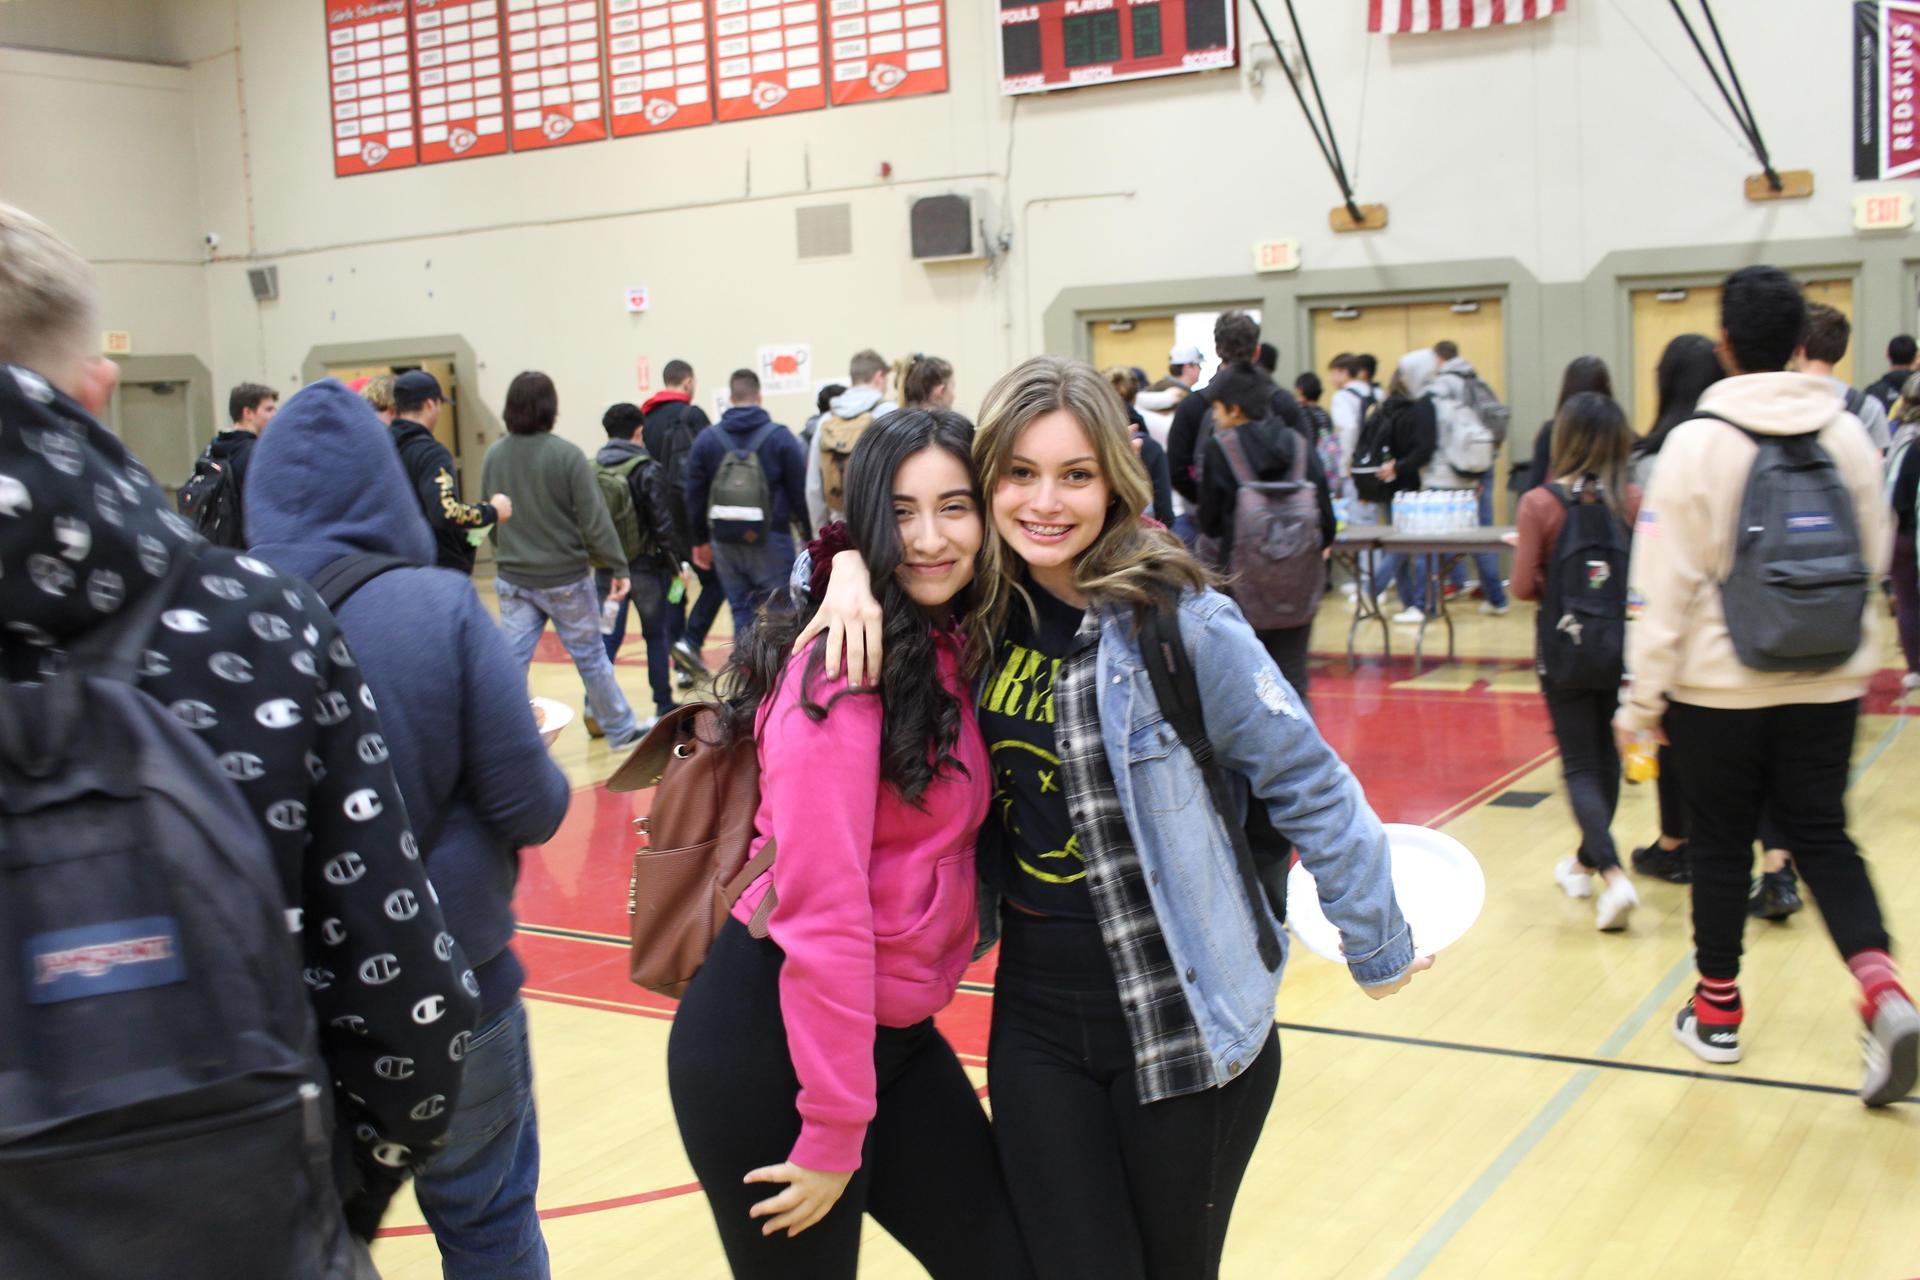 Azucena Vazquez and Kirsta Pitarre posing